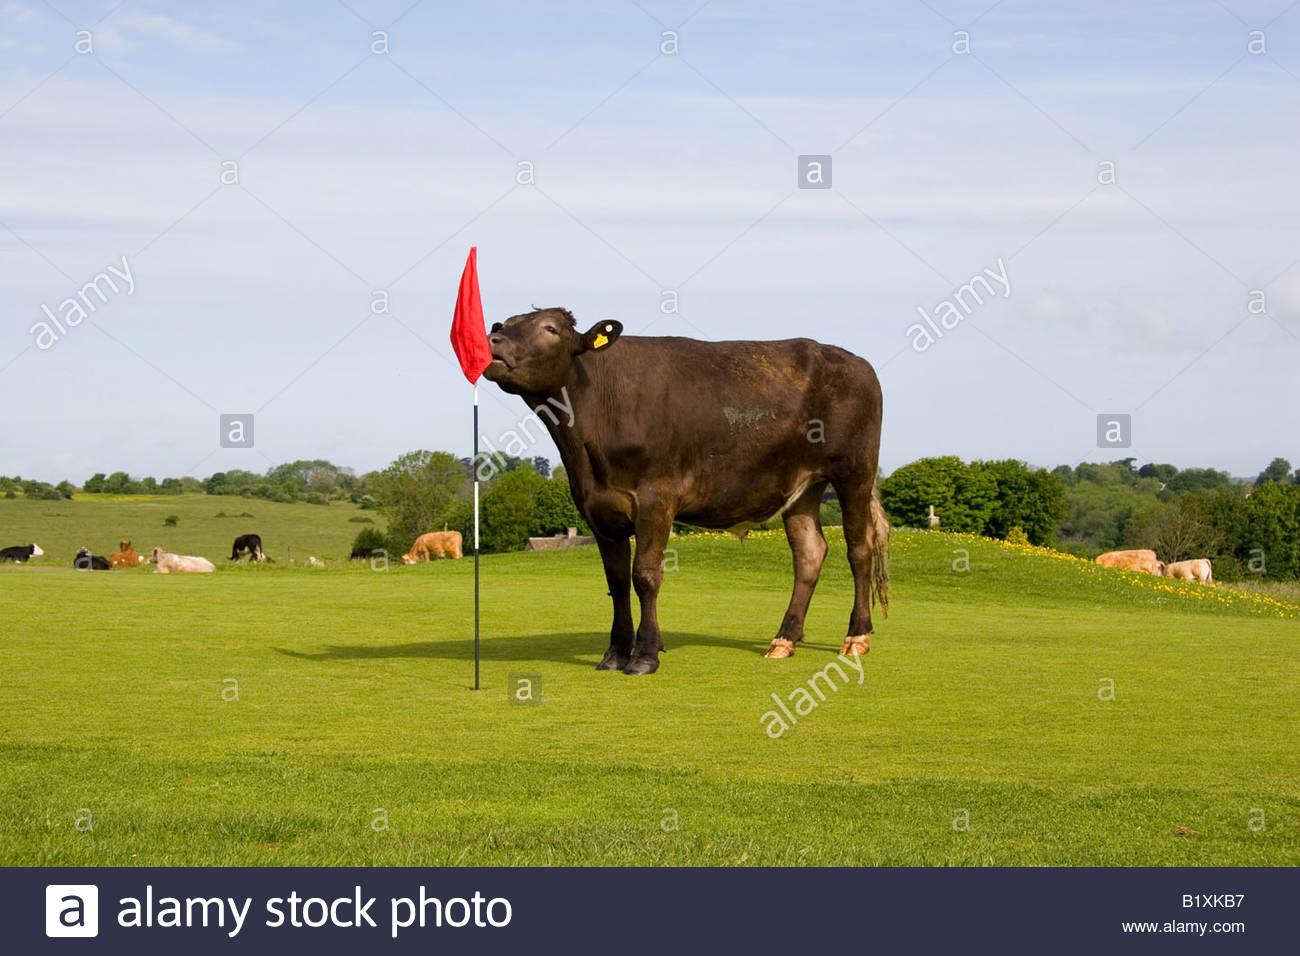 cattle-on-the-putting-green-on-minchinhampton-common-gloucestershire-B1XKB7.jpg